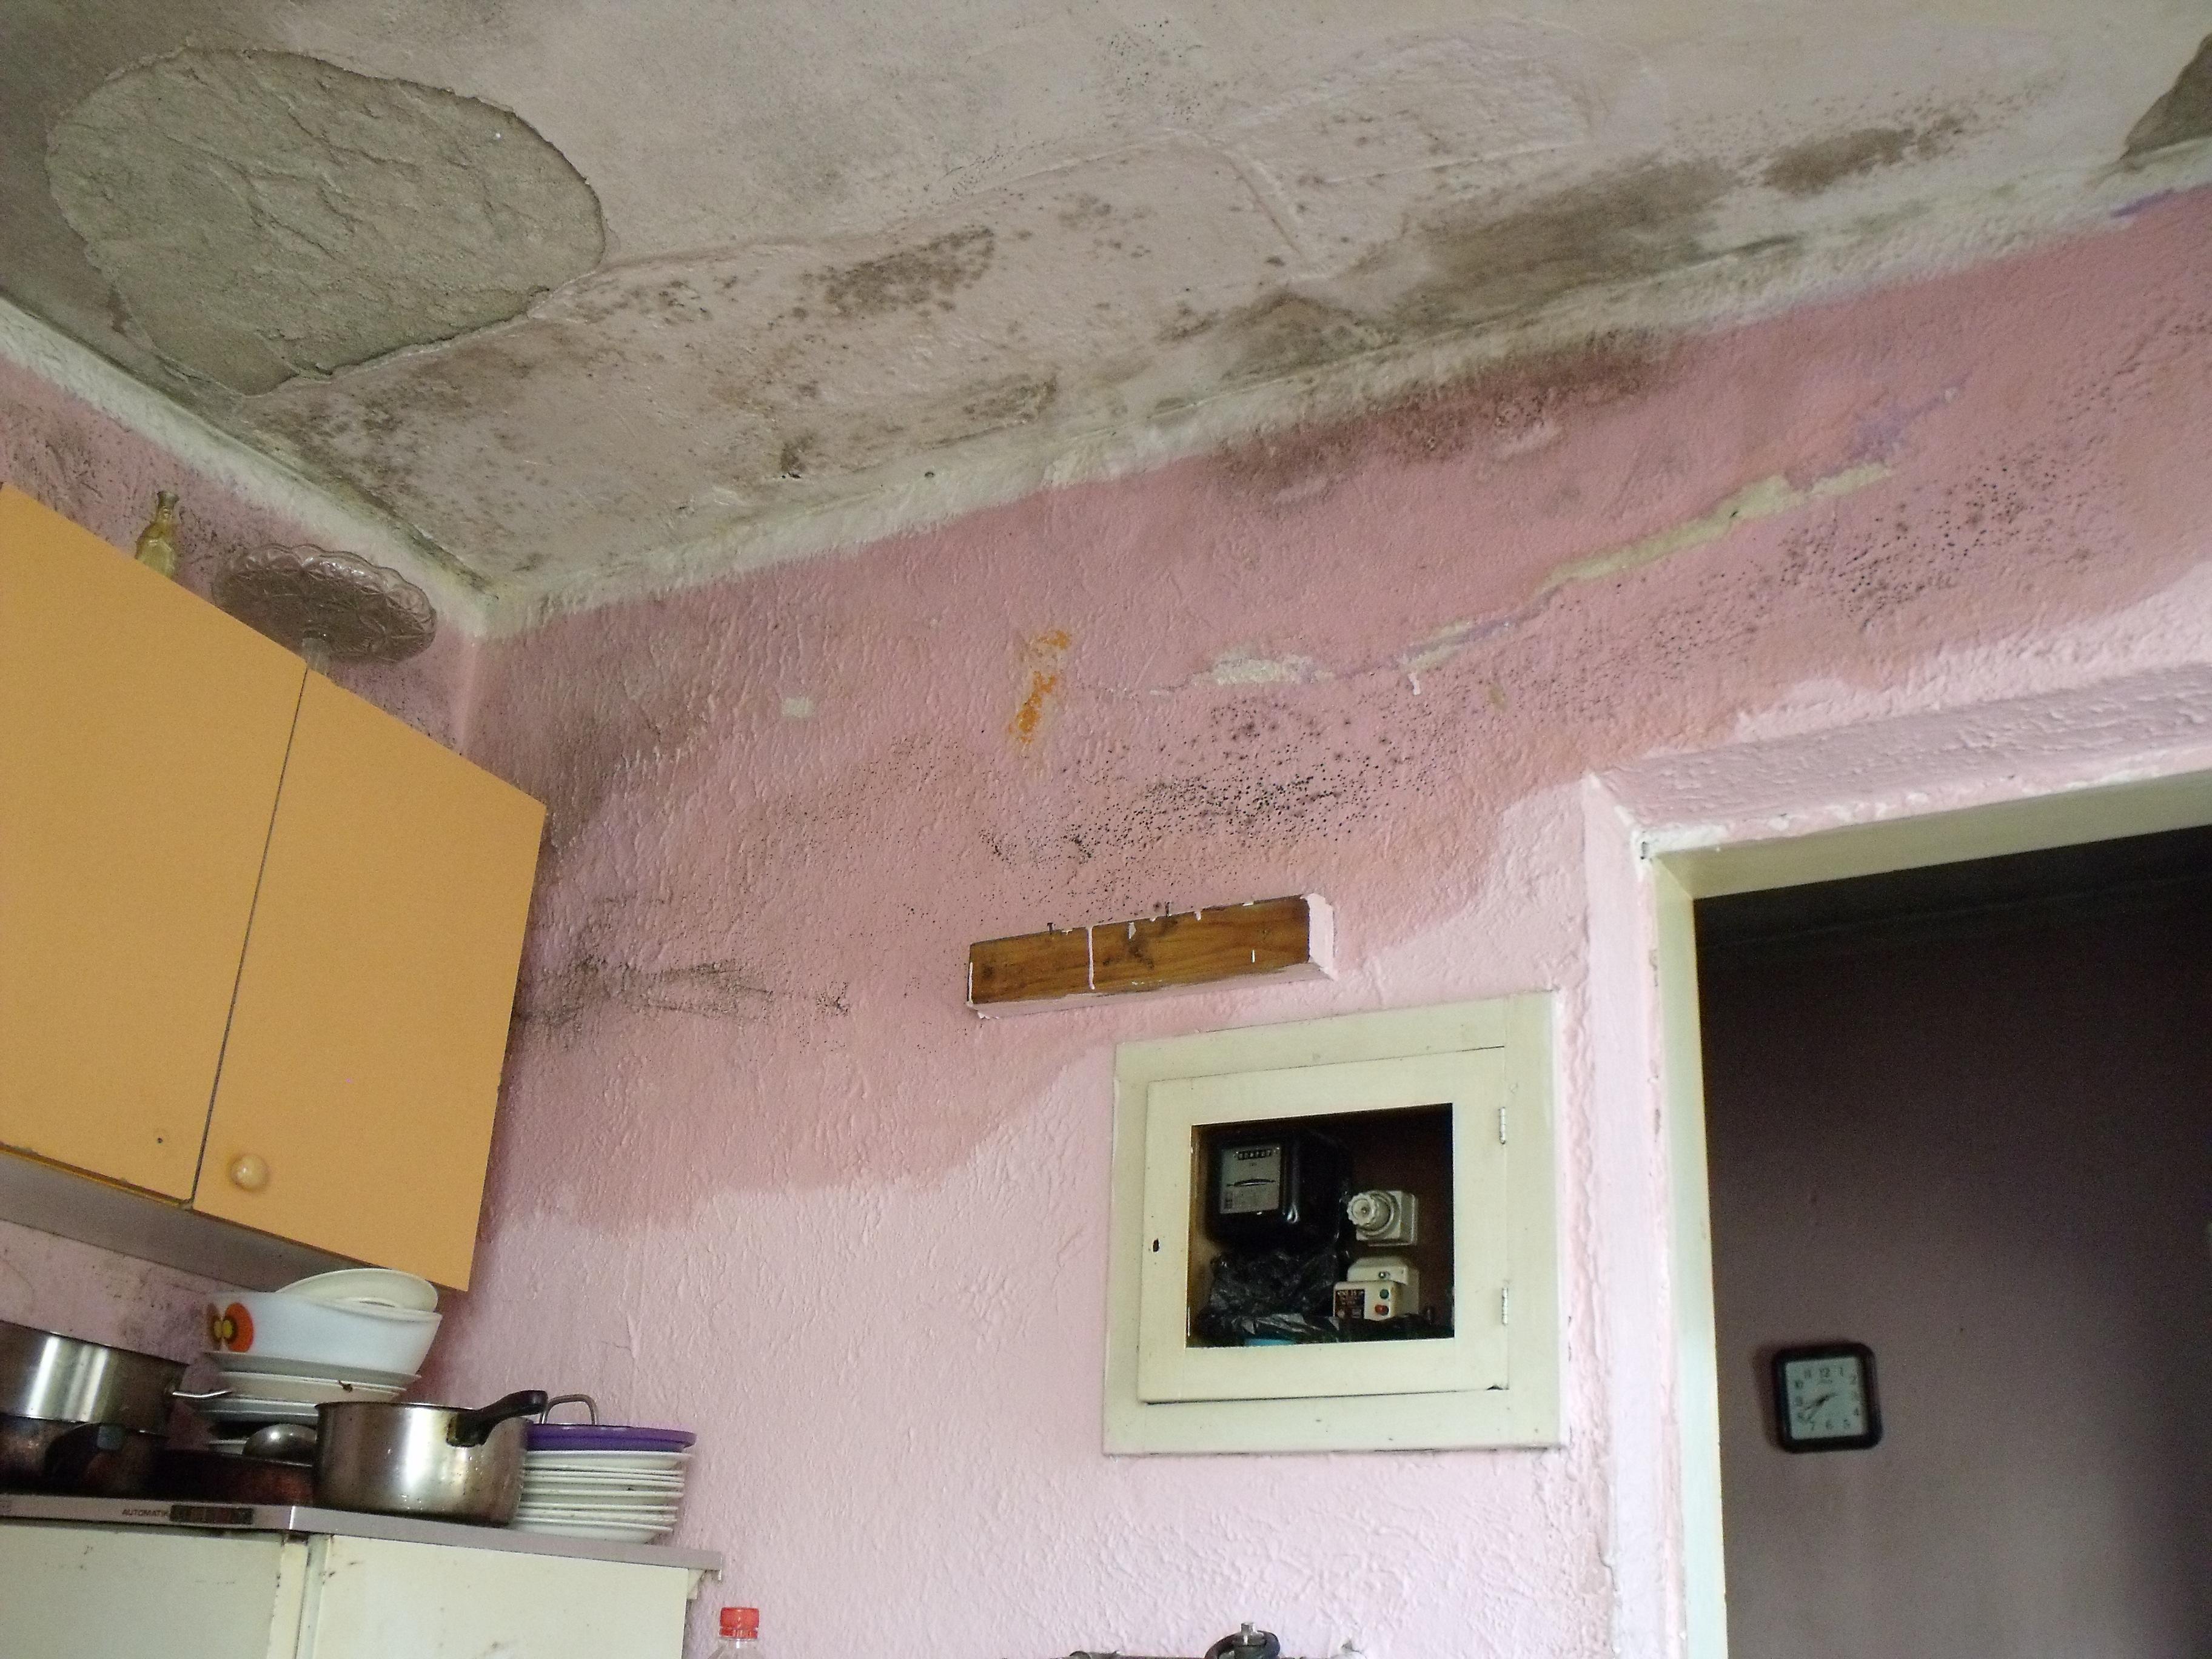 situation der roma in serbien › flüchtlingsrat niedersachsen